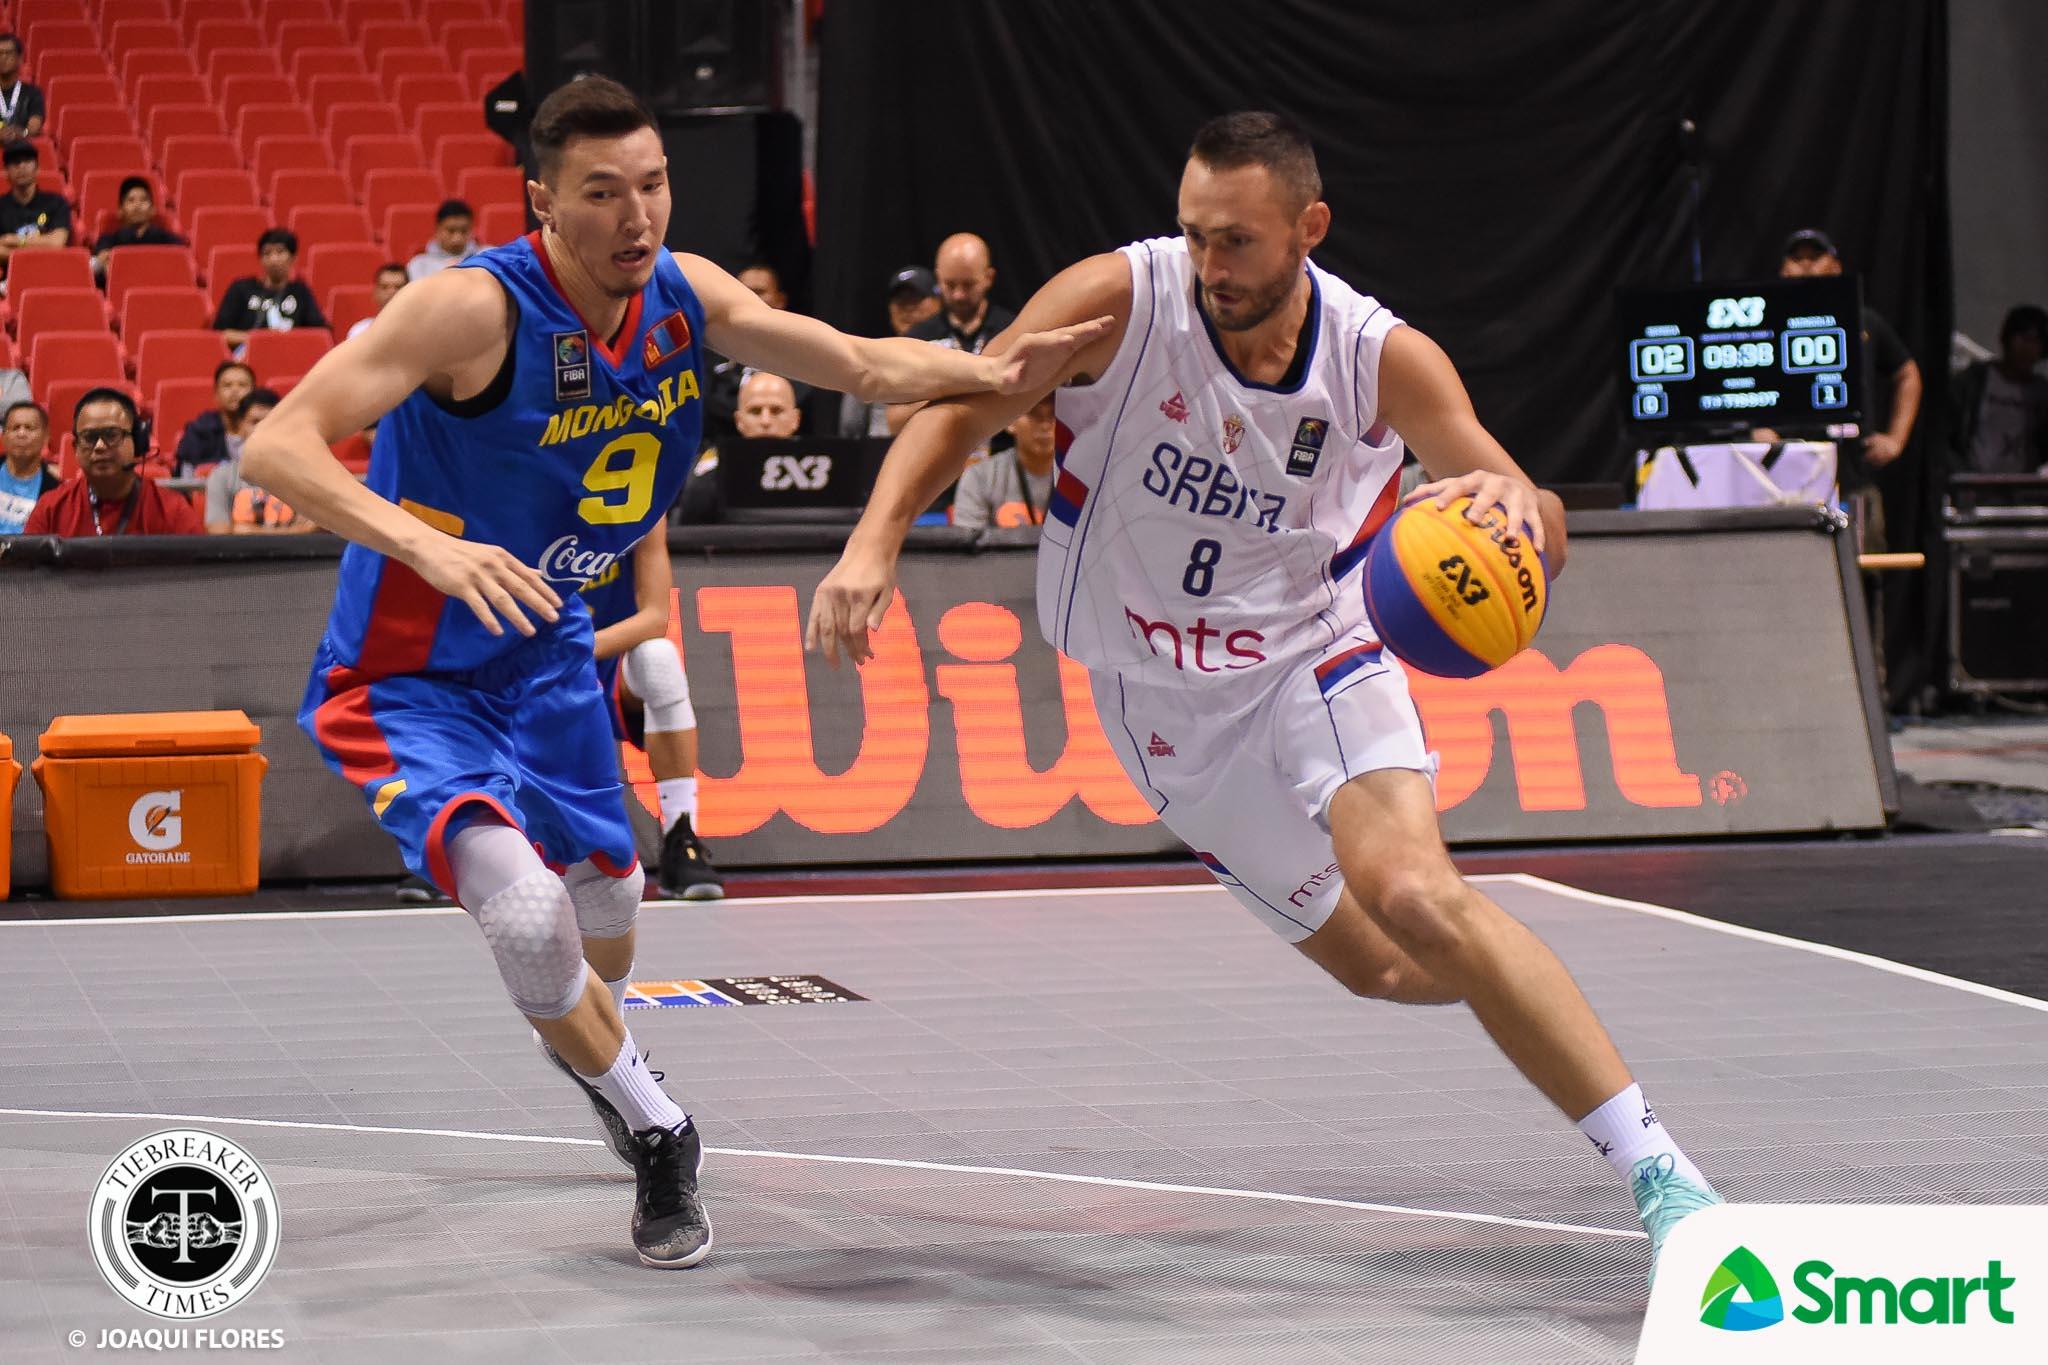 f759f17bd0c0 Tiebreaker Times Serbia spearheads 3x3 World Cup semifinal cast 2018 FIBA  3X3 World Cup 3x3 Basketball